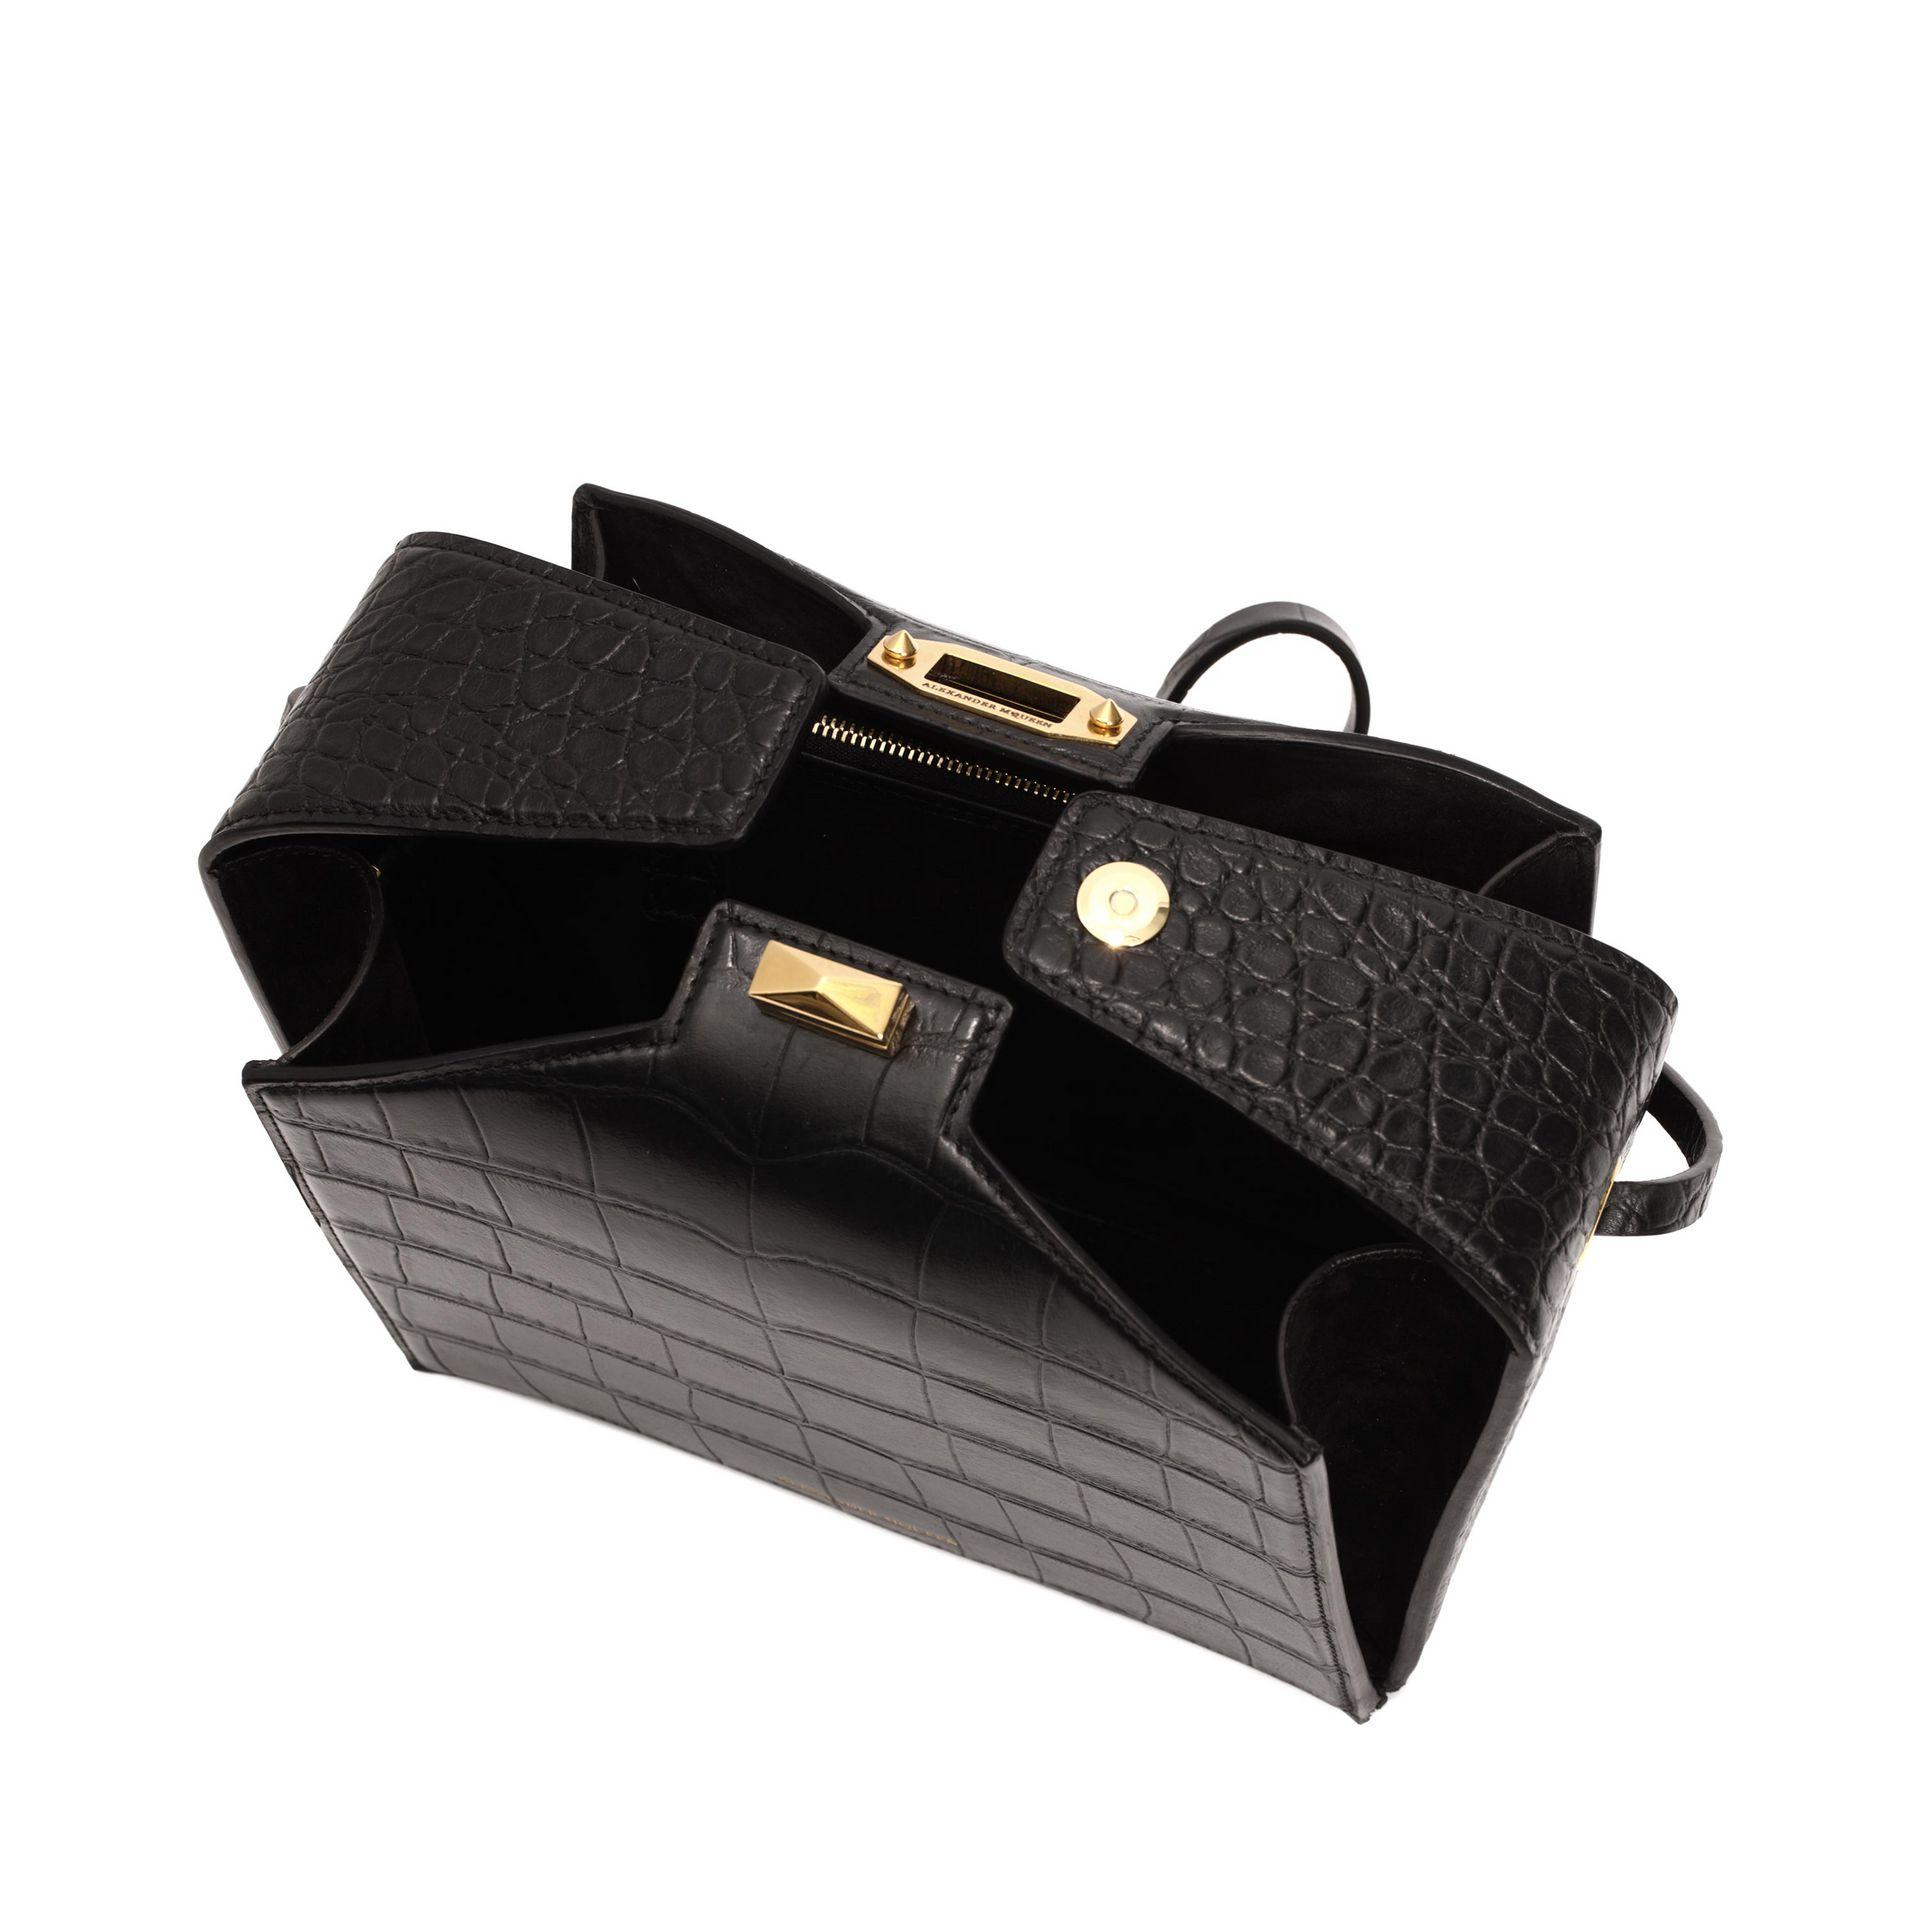 8ed67ba891fa9 Lyst - Alexander mcqueen The Box Bag In Soft Croc in Black